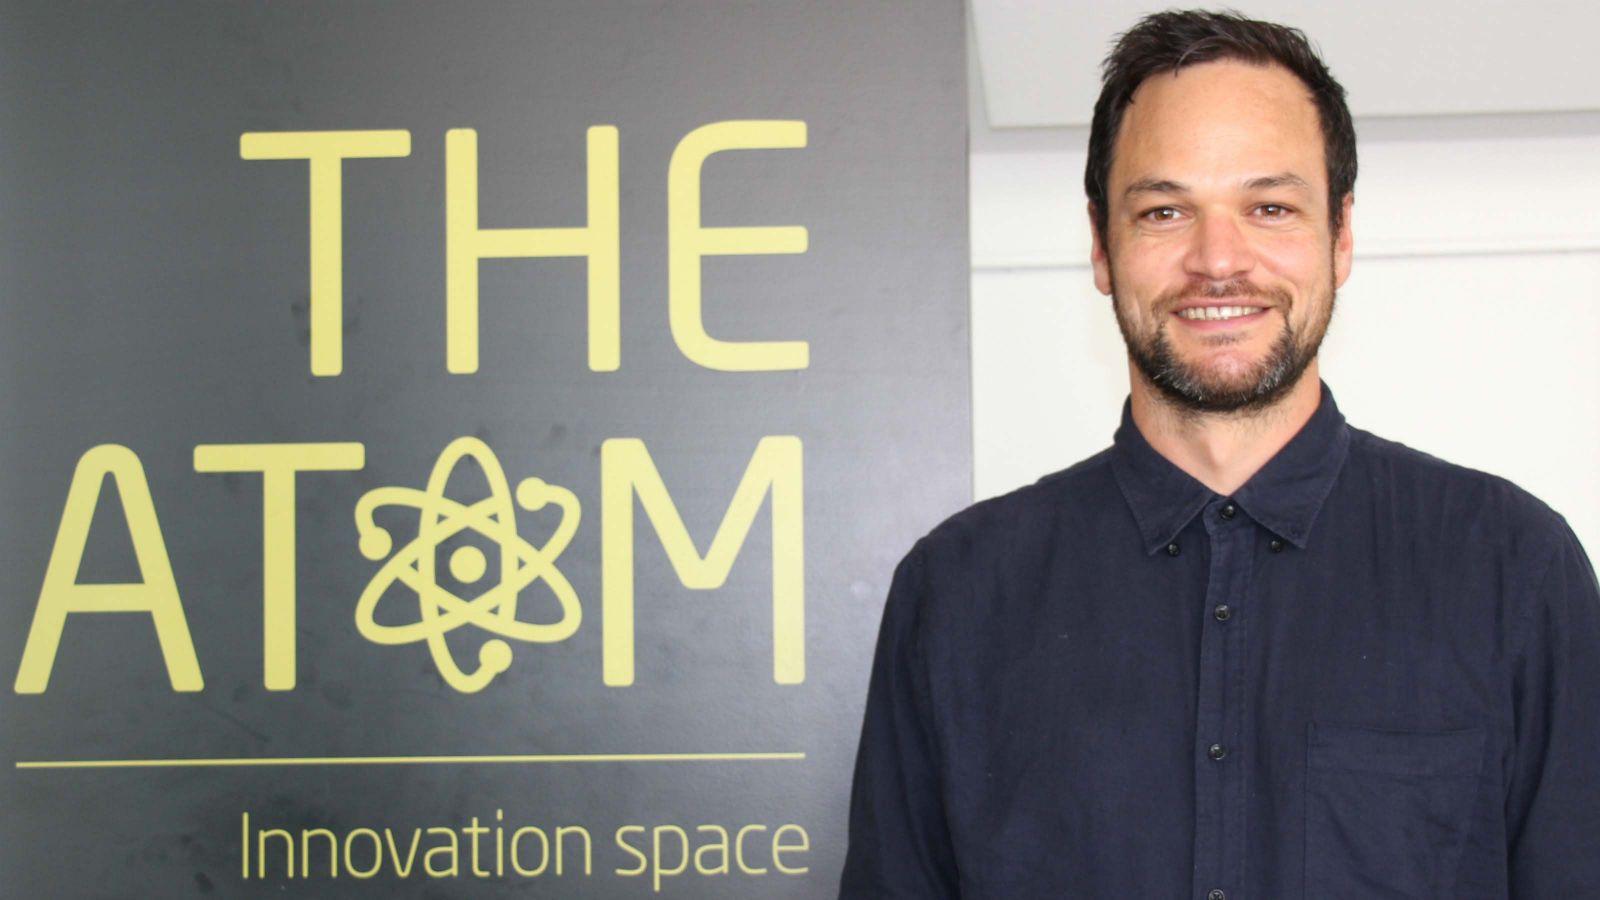 A profile shot of Jesse Pirini